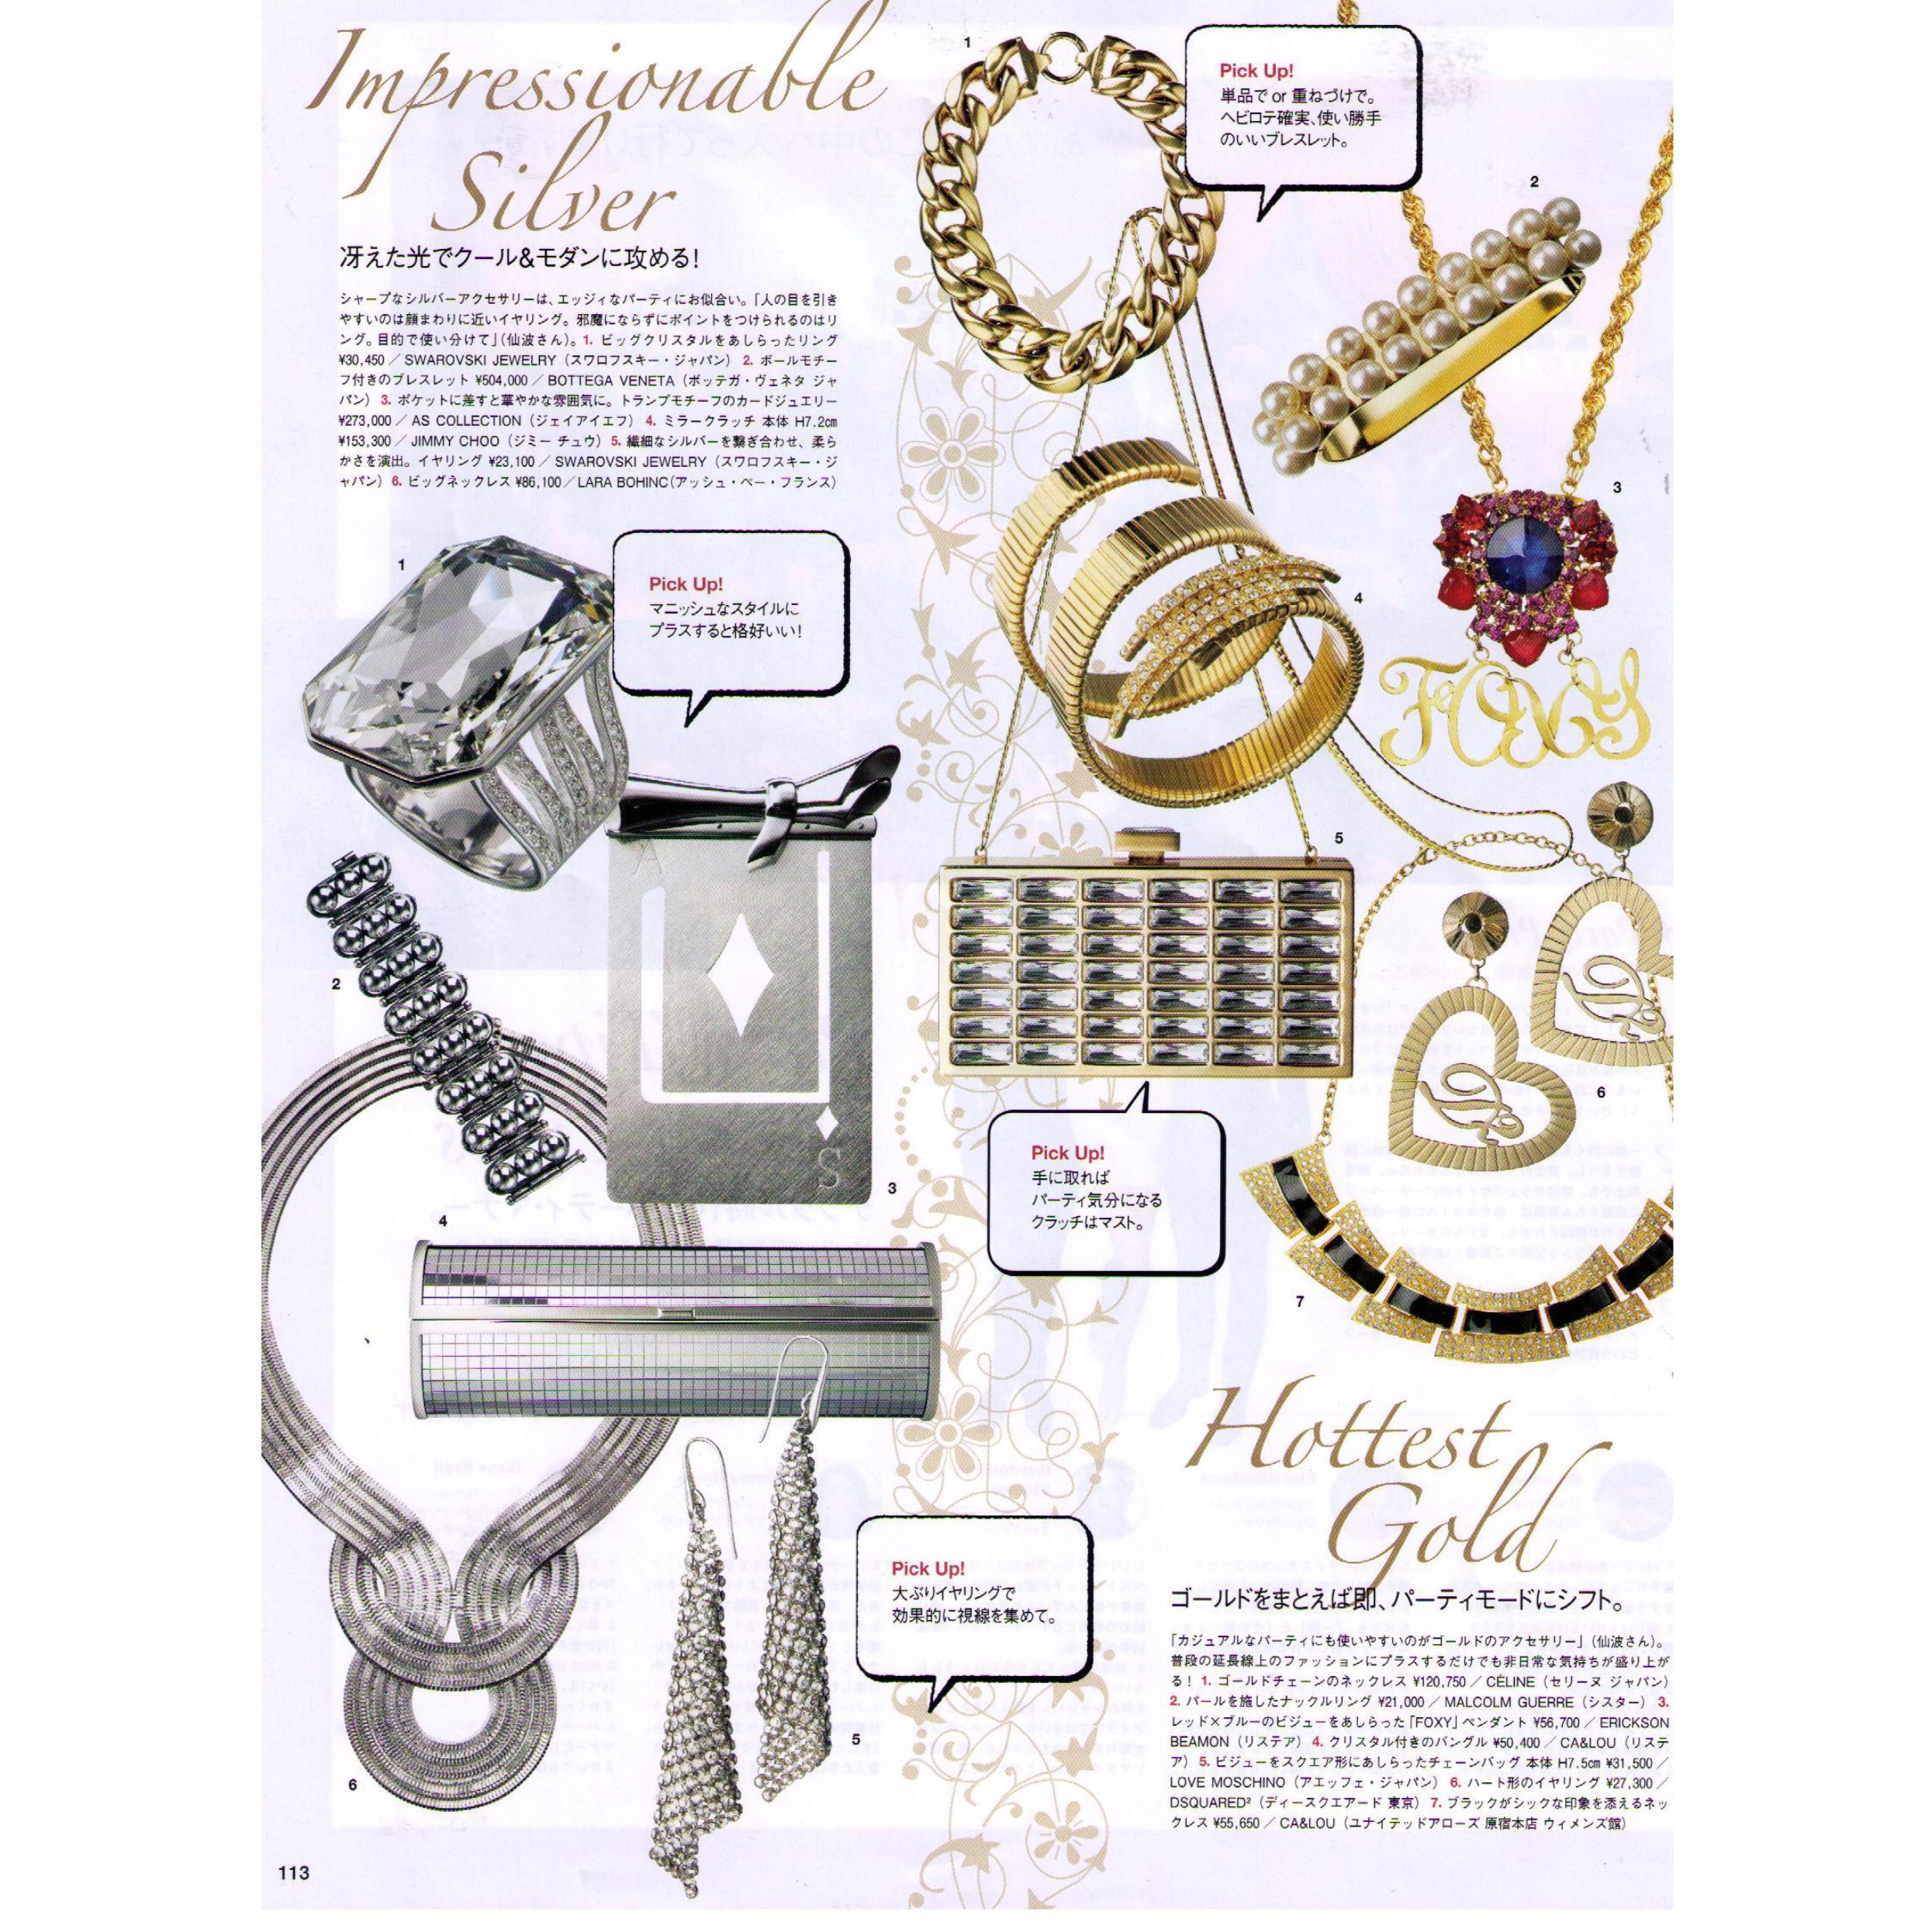 Jewellery Editorial Bohinc Studio Lighting Diagram Jewelry Vogue Japan January 2013